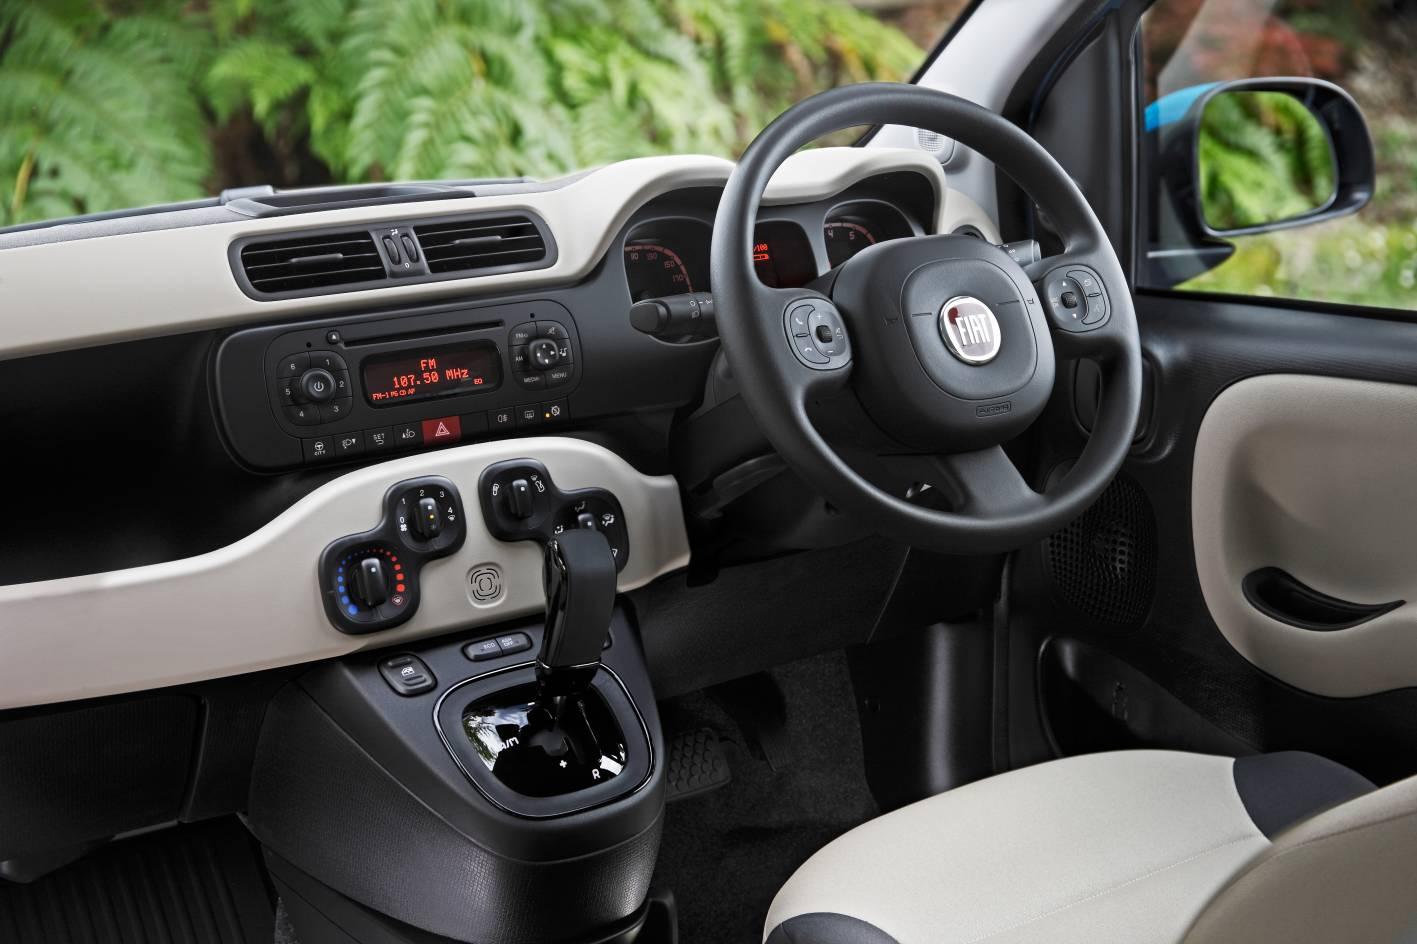 Fiat Panda Easy Interior 2014 Fiat Panda Easy Interior